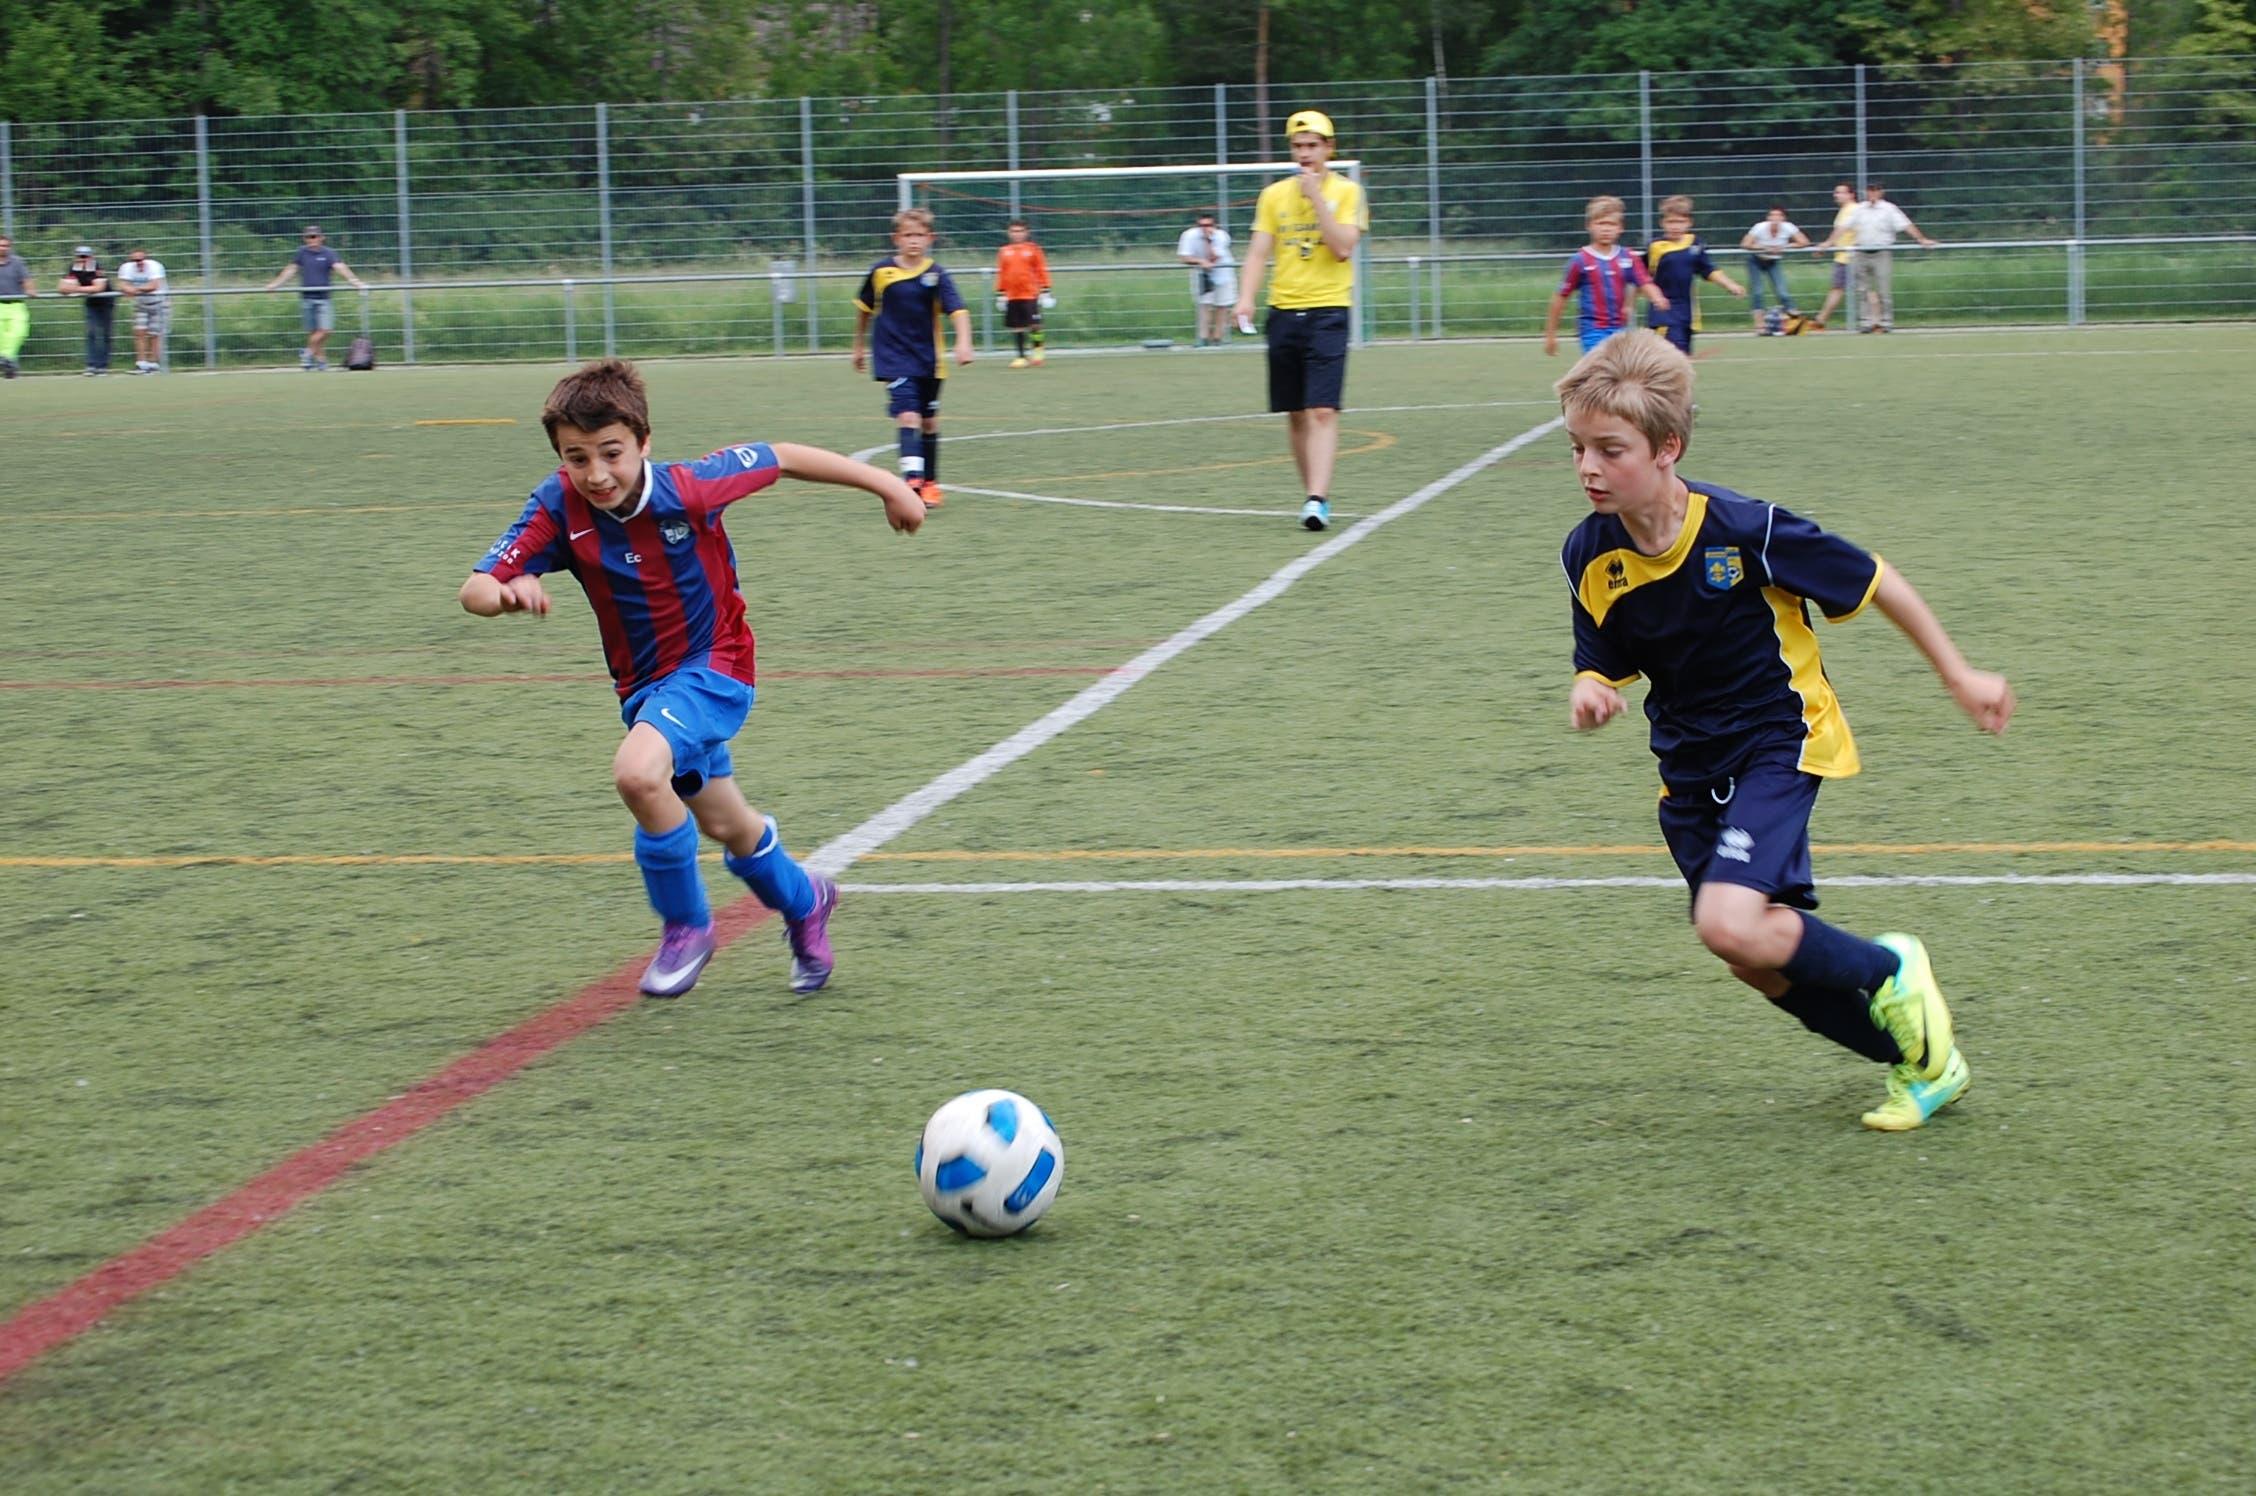 Schlierens E1-Junioren (in Dunkelblau) gegen Engstringen